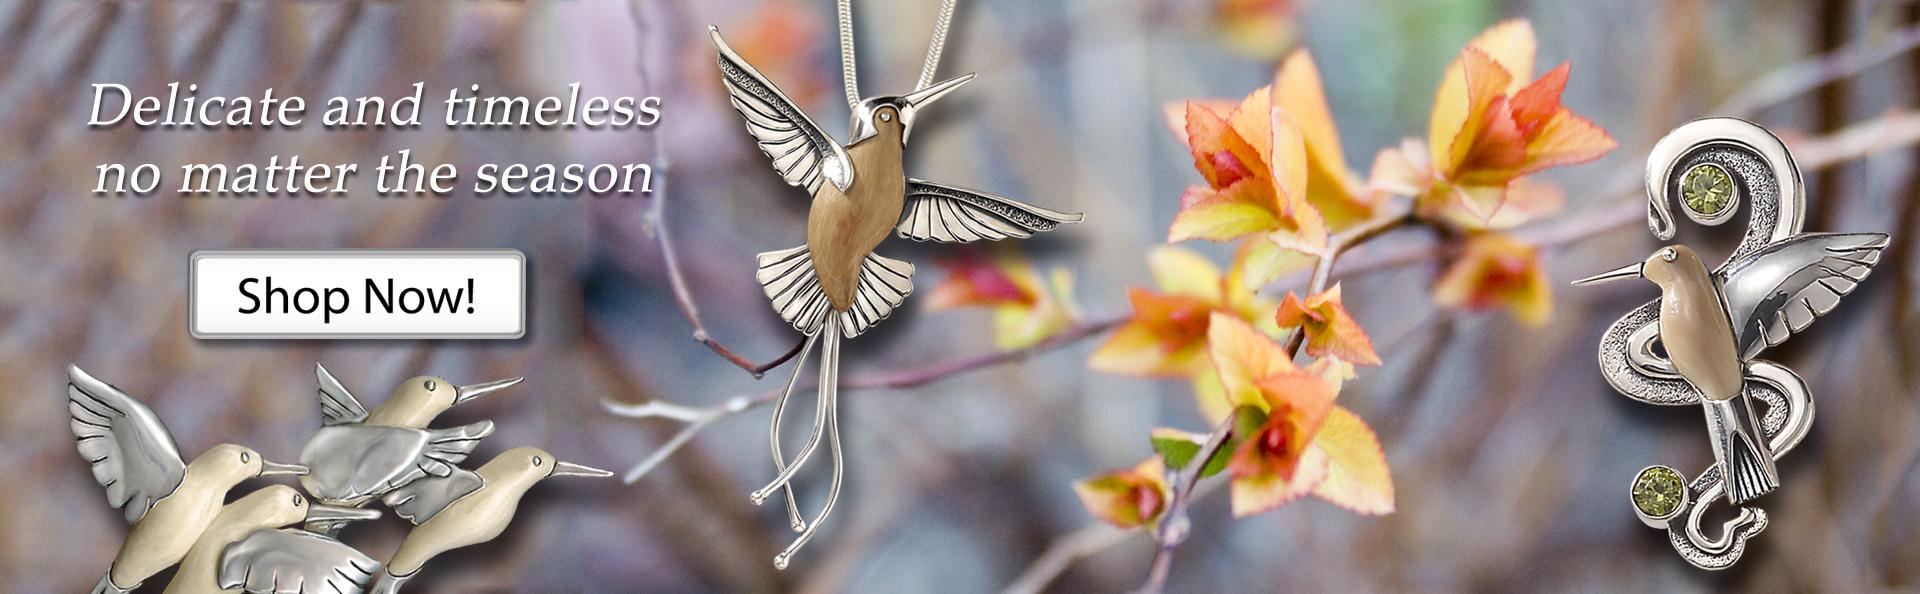 Zealandia silver hummingbird jewelry hummingbird necklace